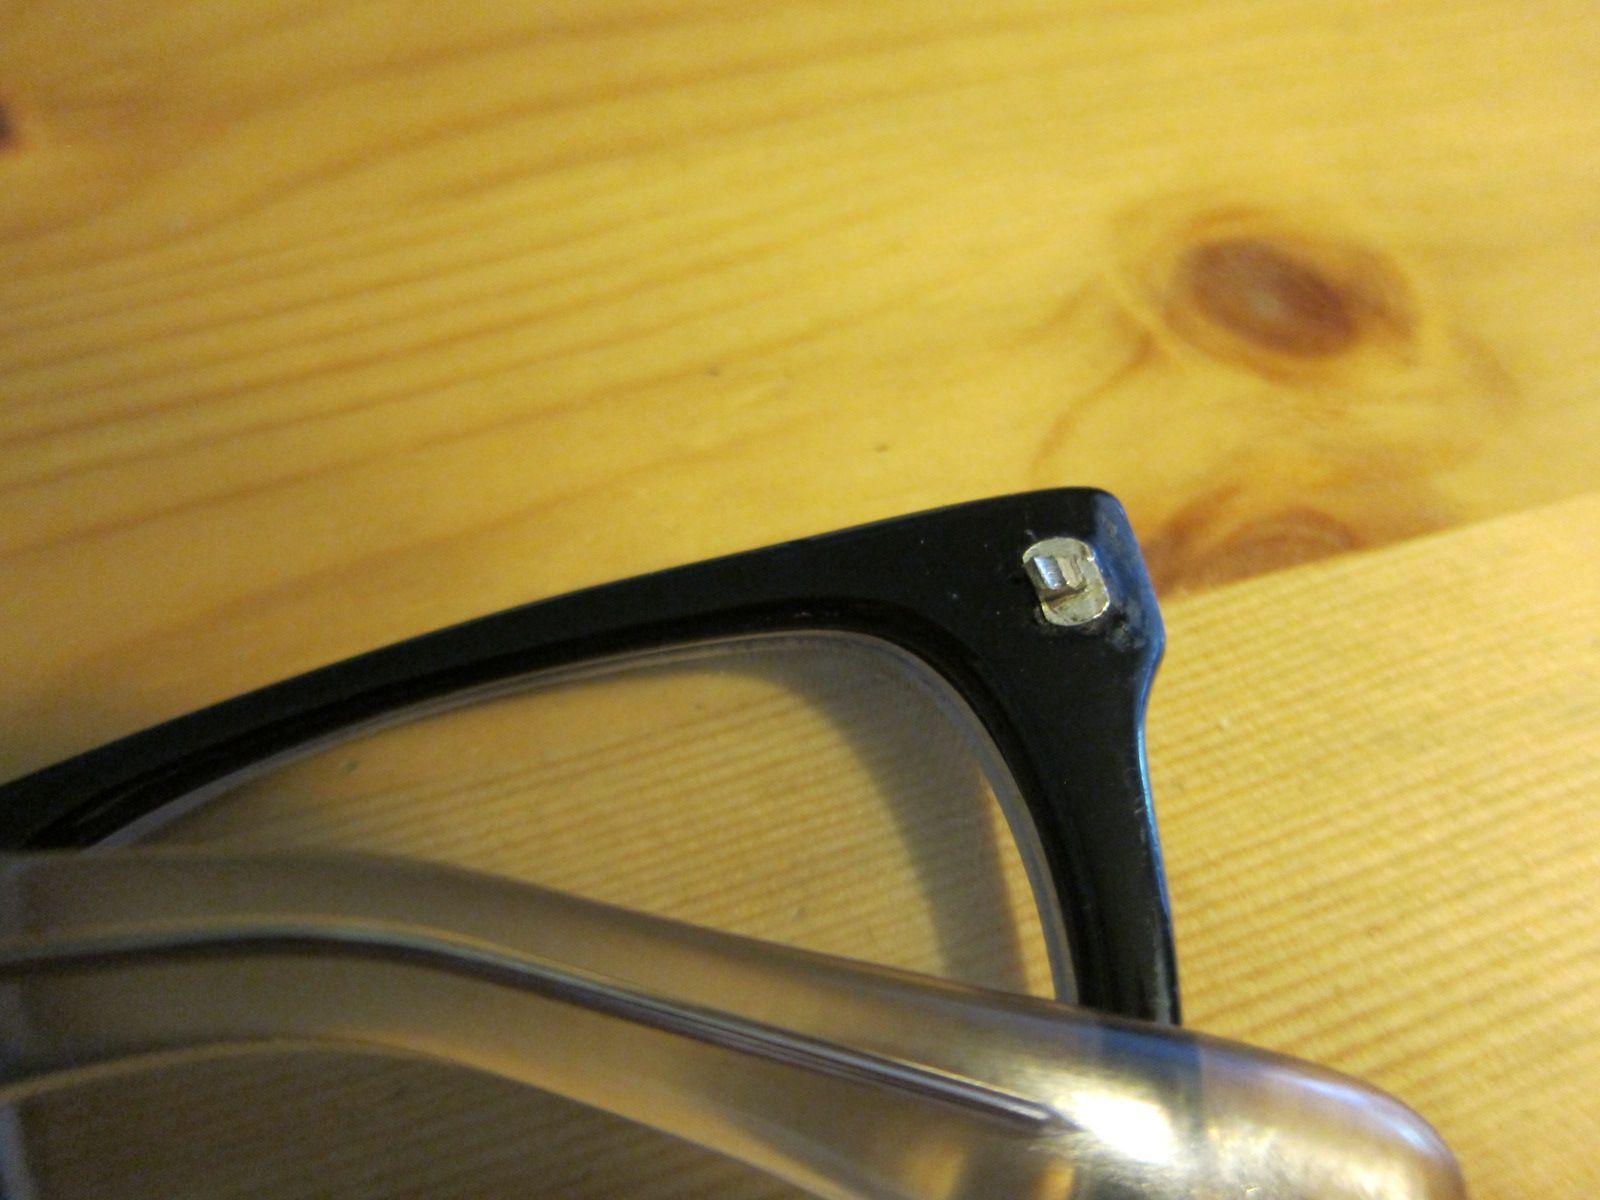 How to fix broken hinge on plastic frame glasses Hinges